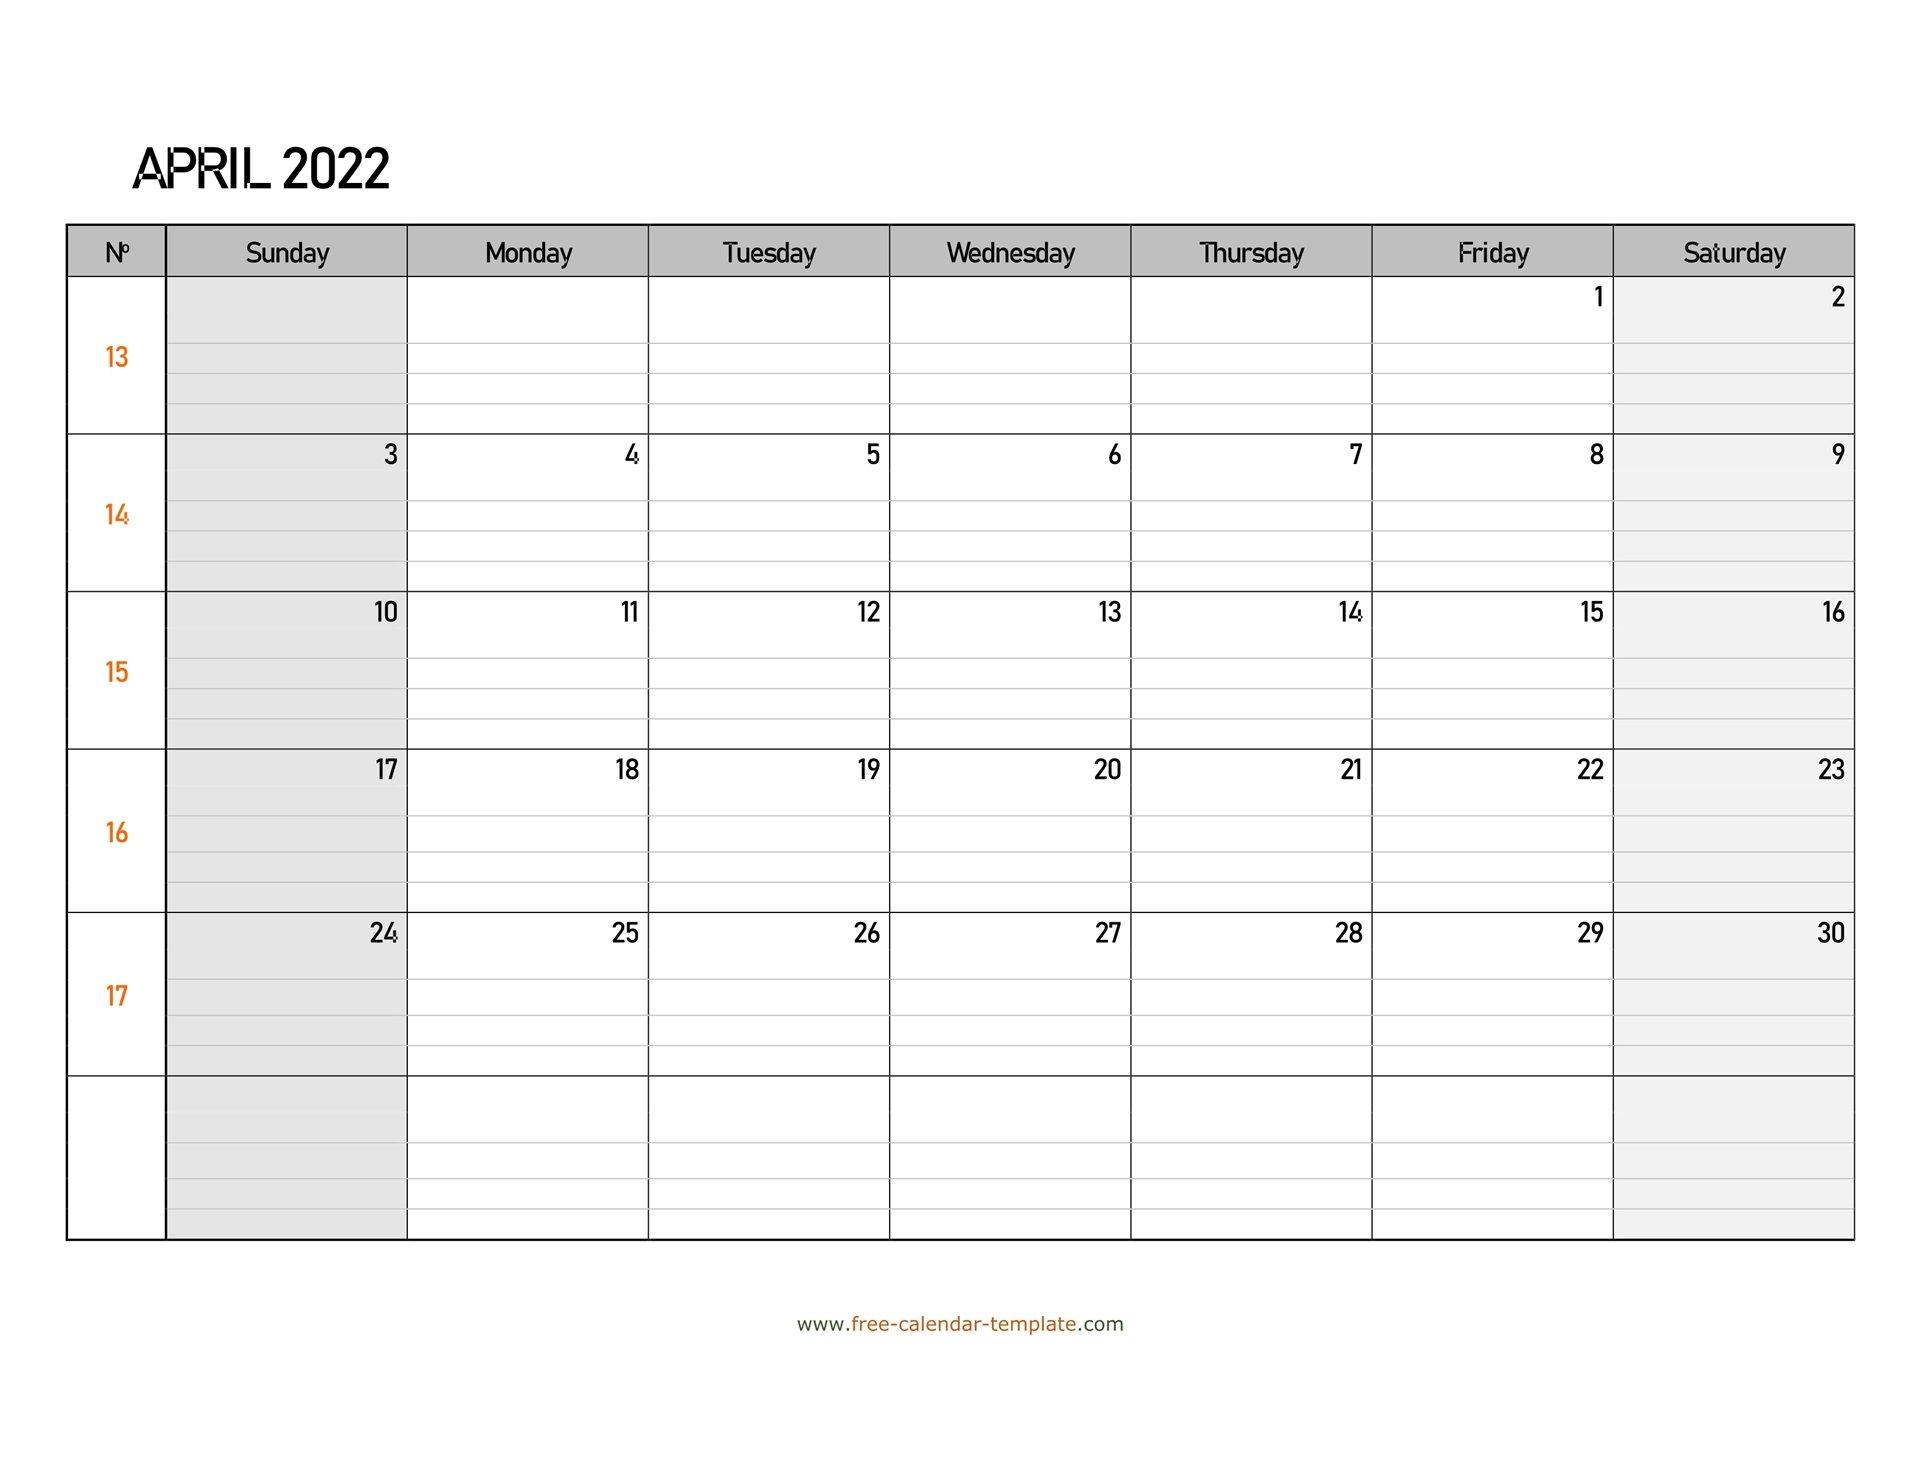 April 2022 Calendar Free Printable With Grid Lines with March & April 2022 Calendar Free Printable